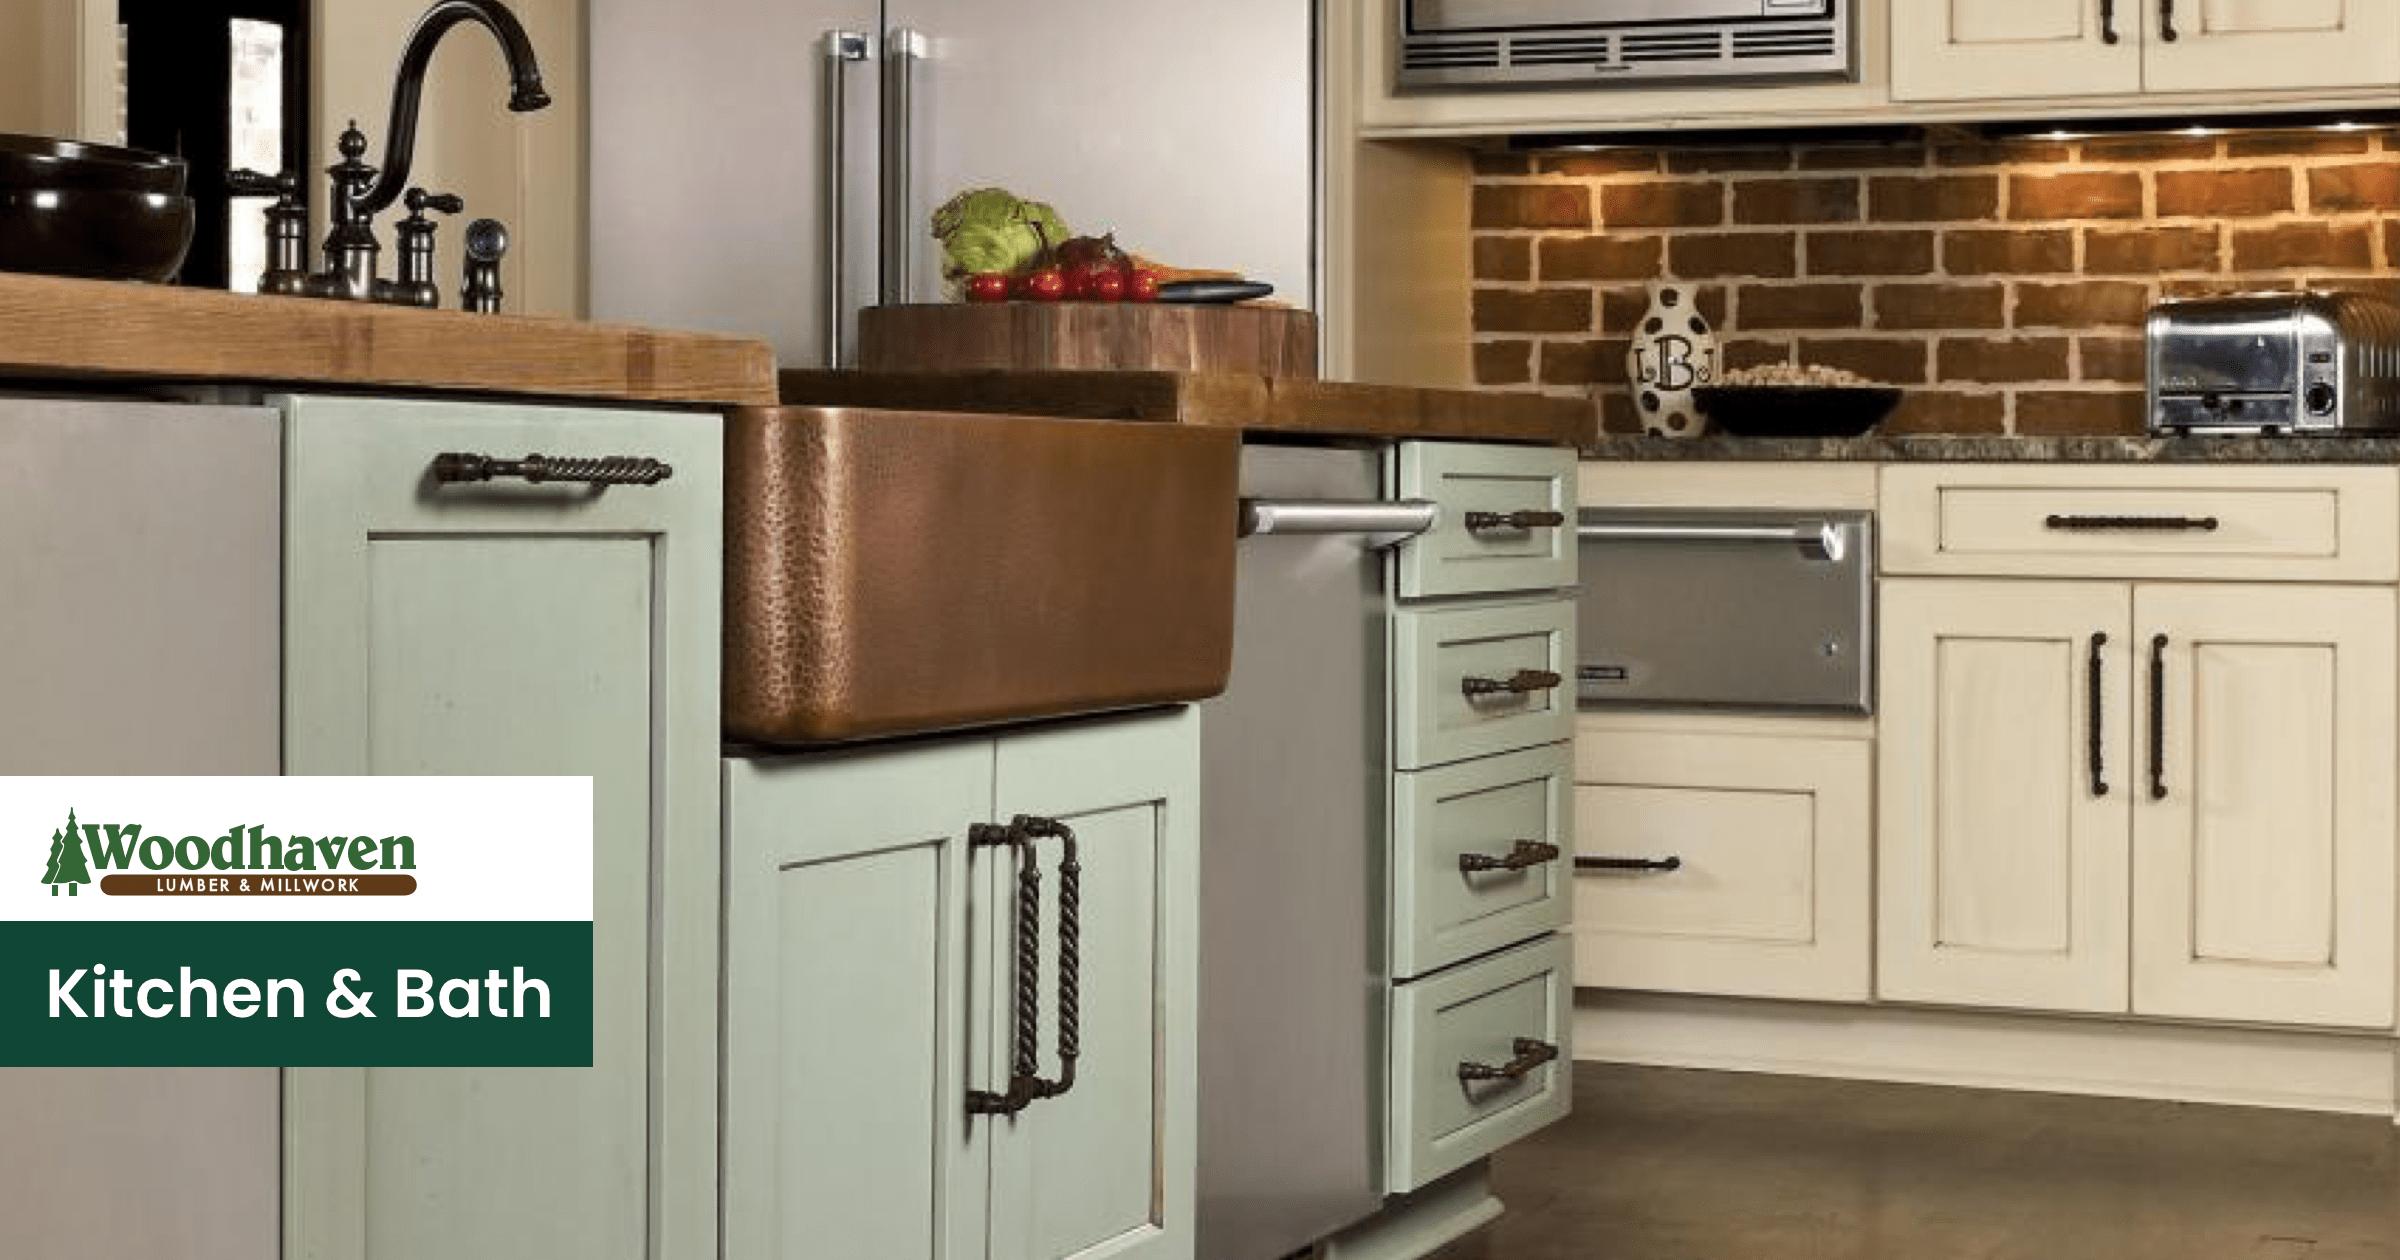 Kitchen & Bath | Woodhaven Lumber